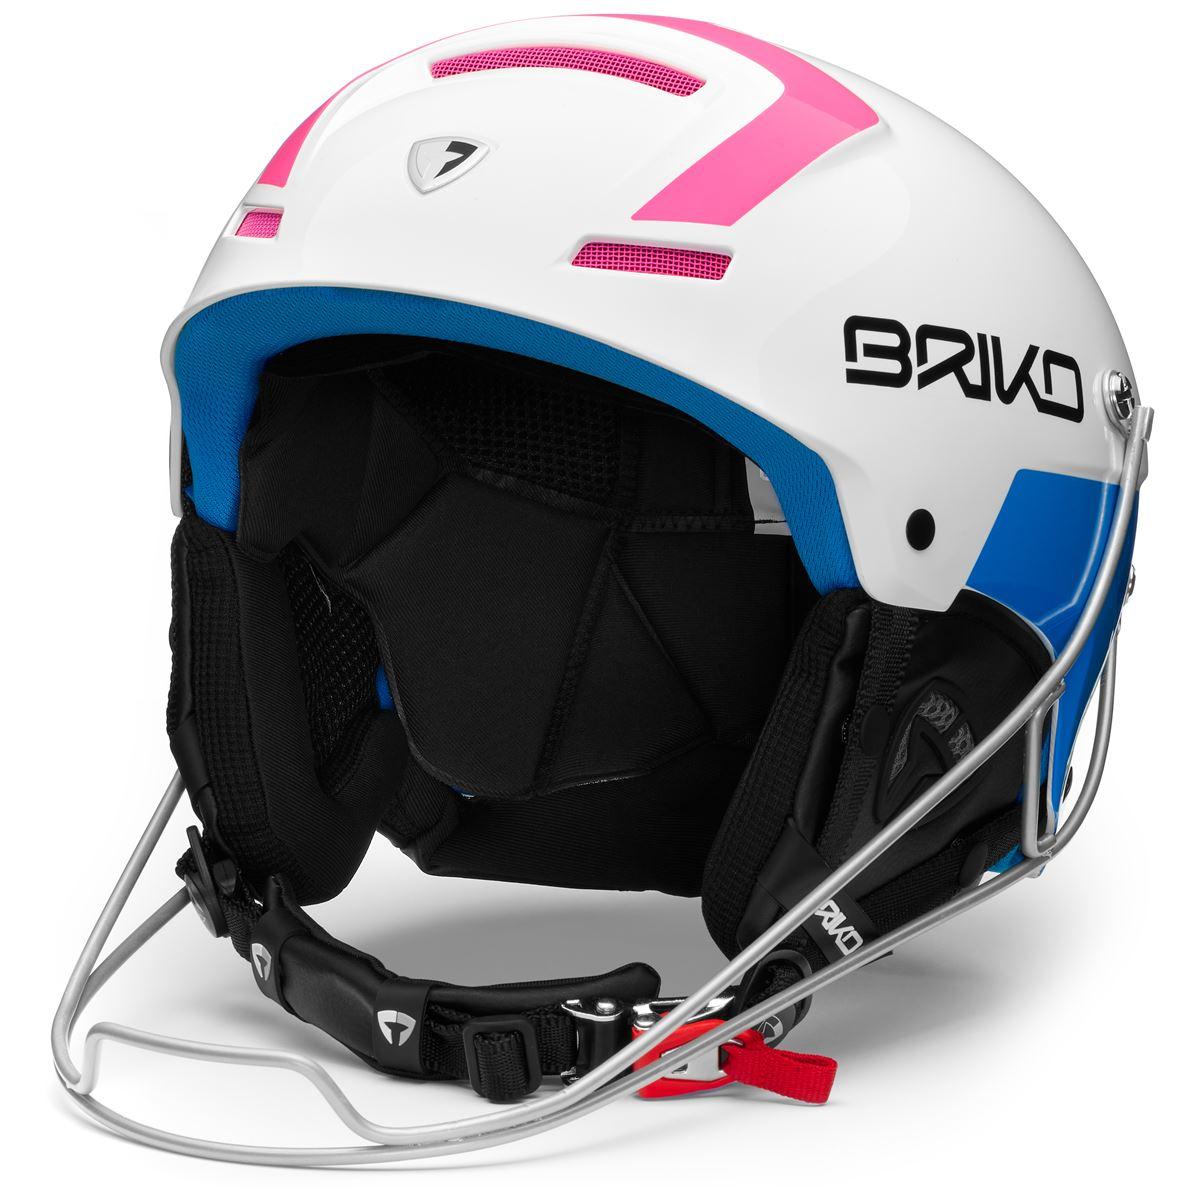 Briko HELMETS SLALOM Helmet Man Woman